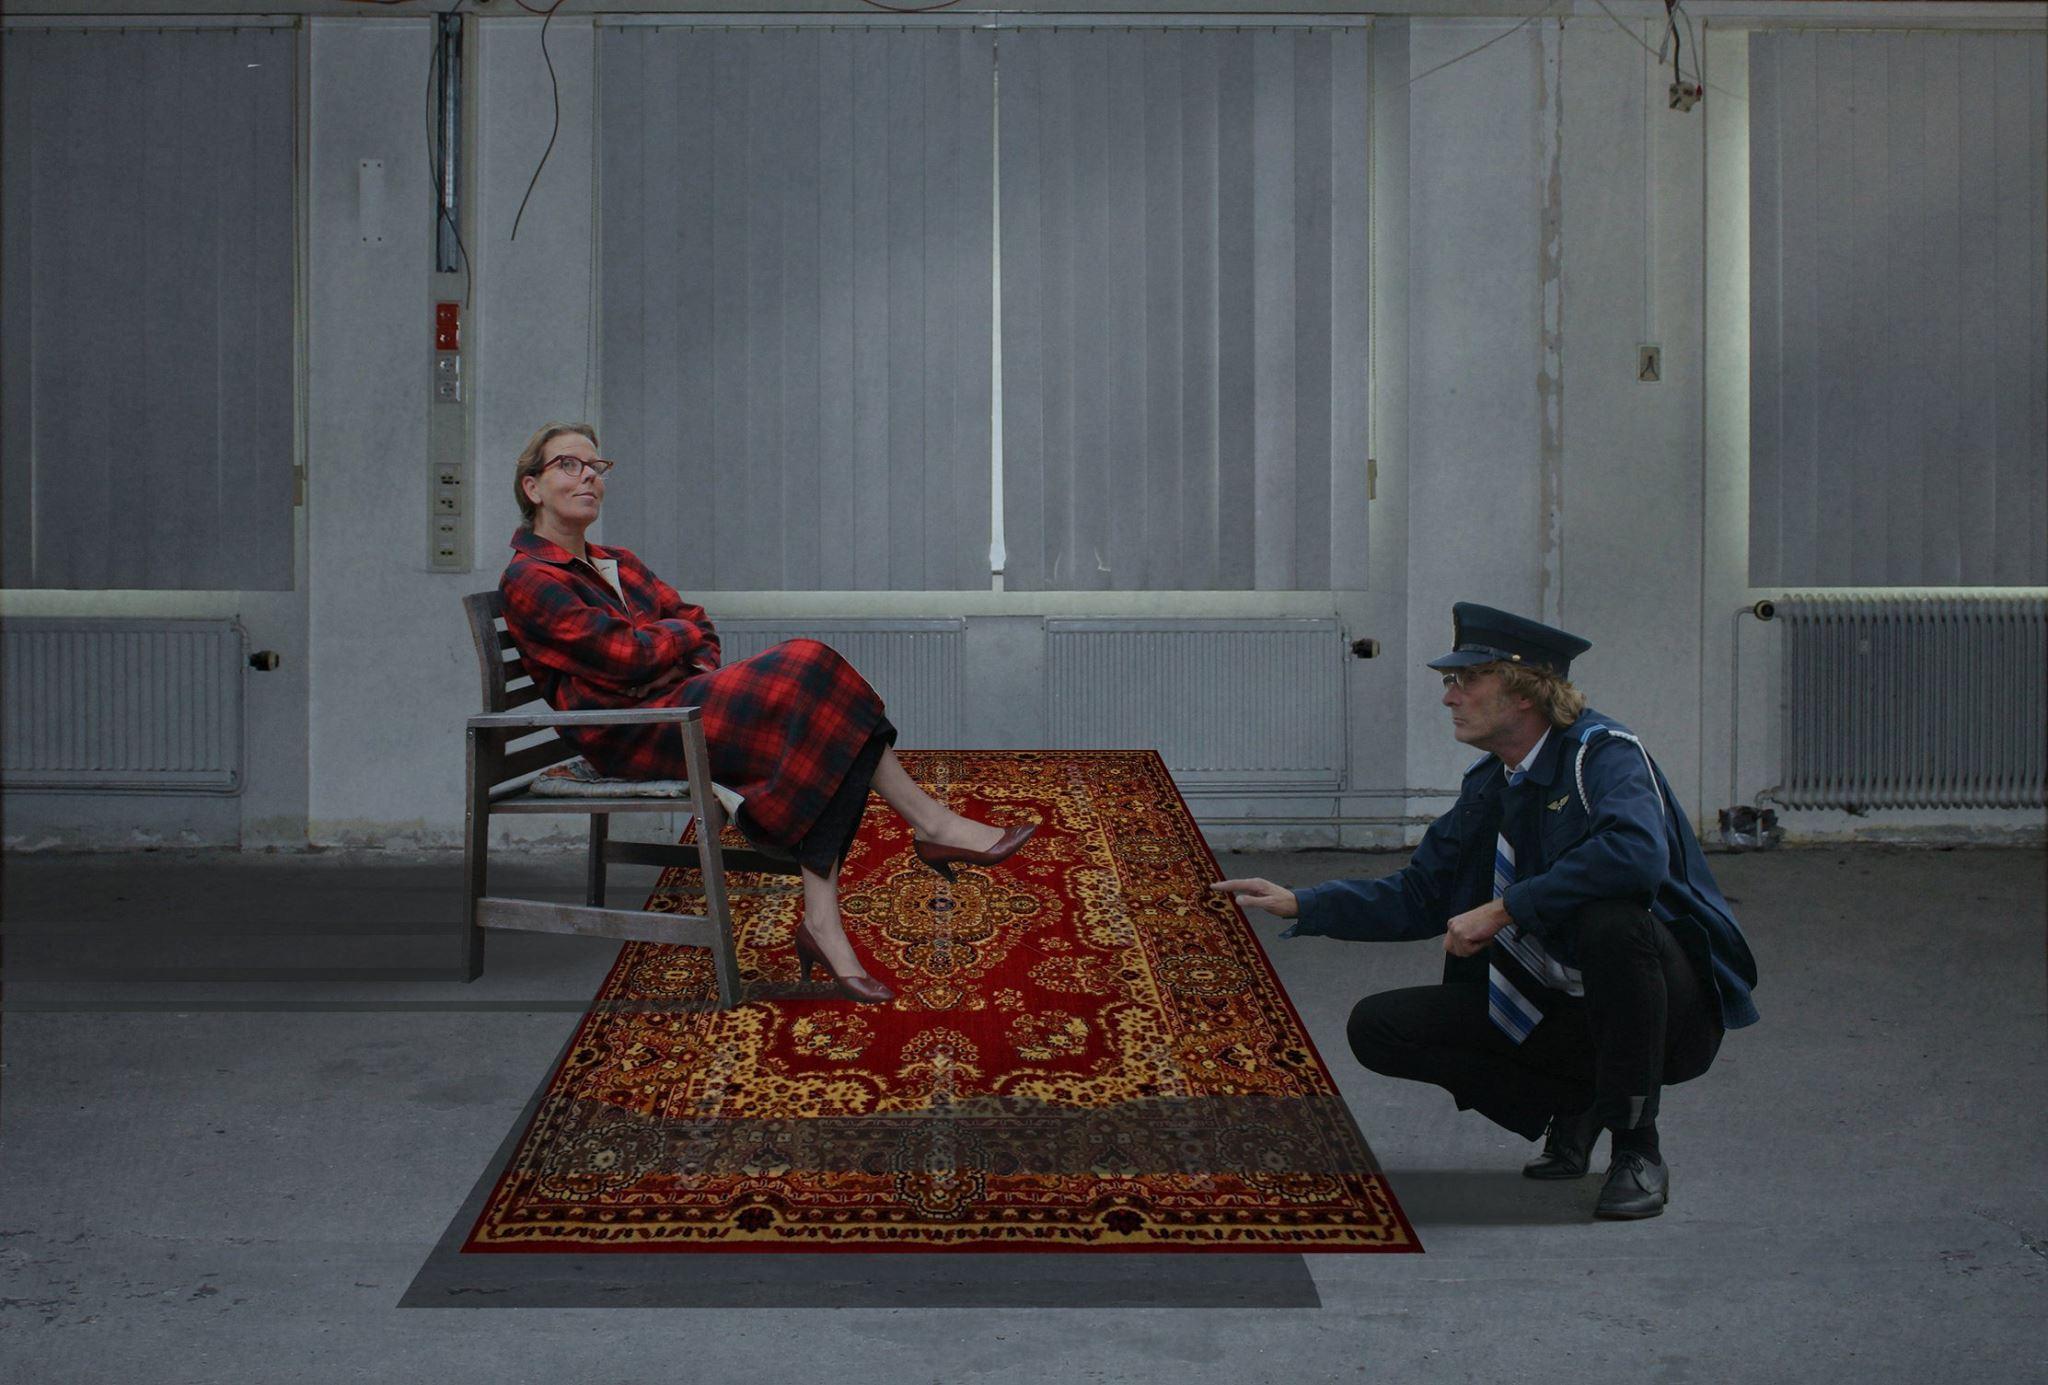 Long-pile carpet